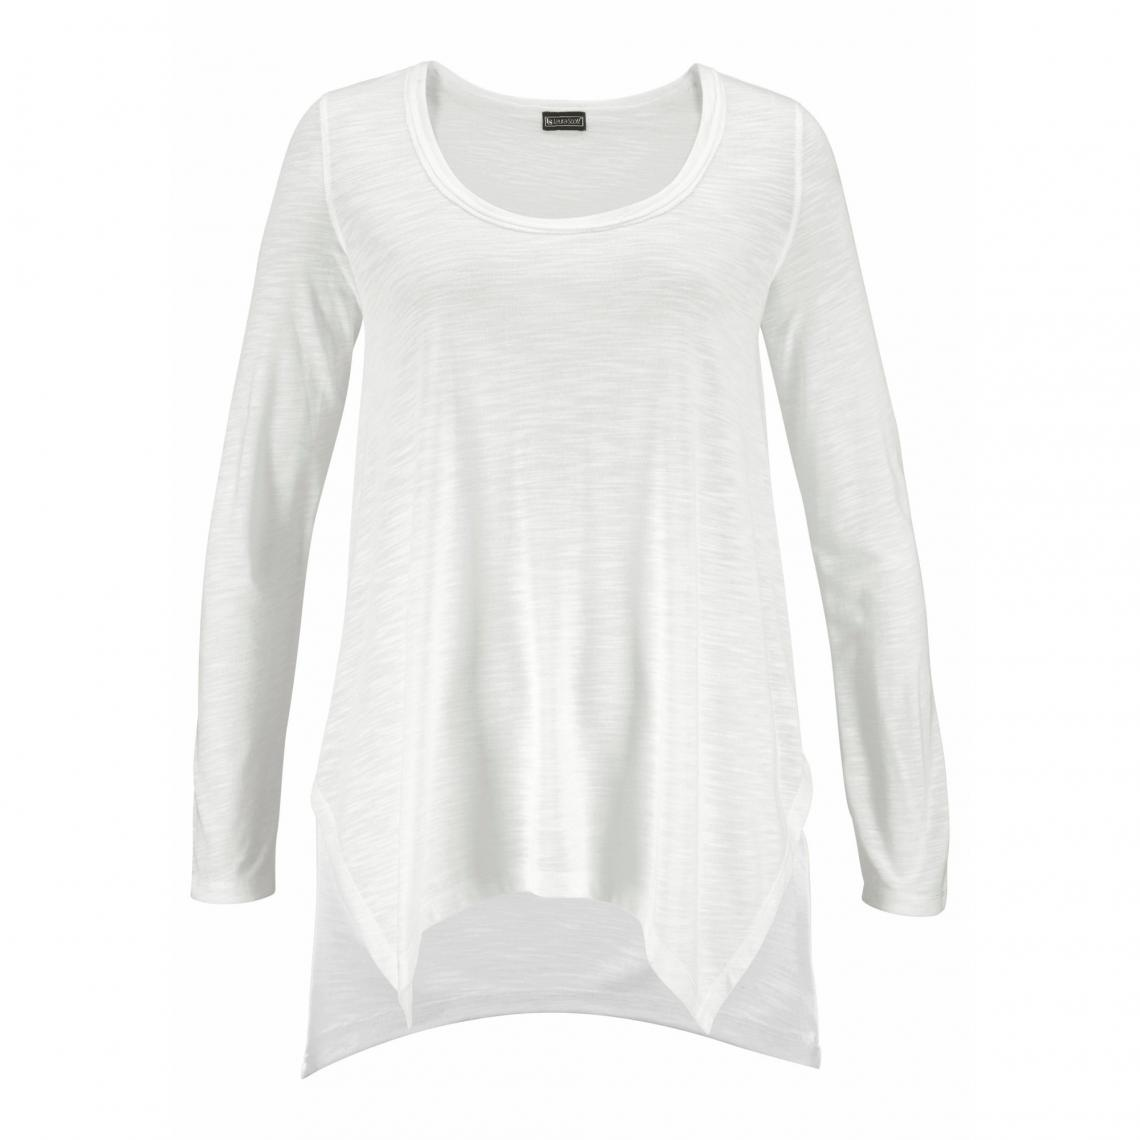 56c50efd2598 Tee-shirt ample long destructuré femme Laura Scott - Blanc Laura Scott